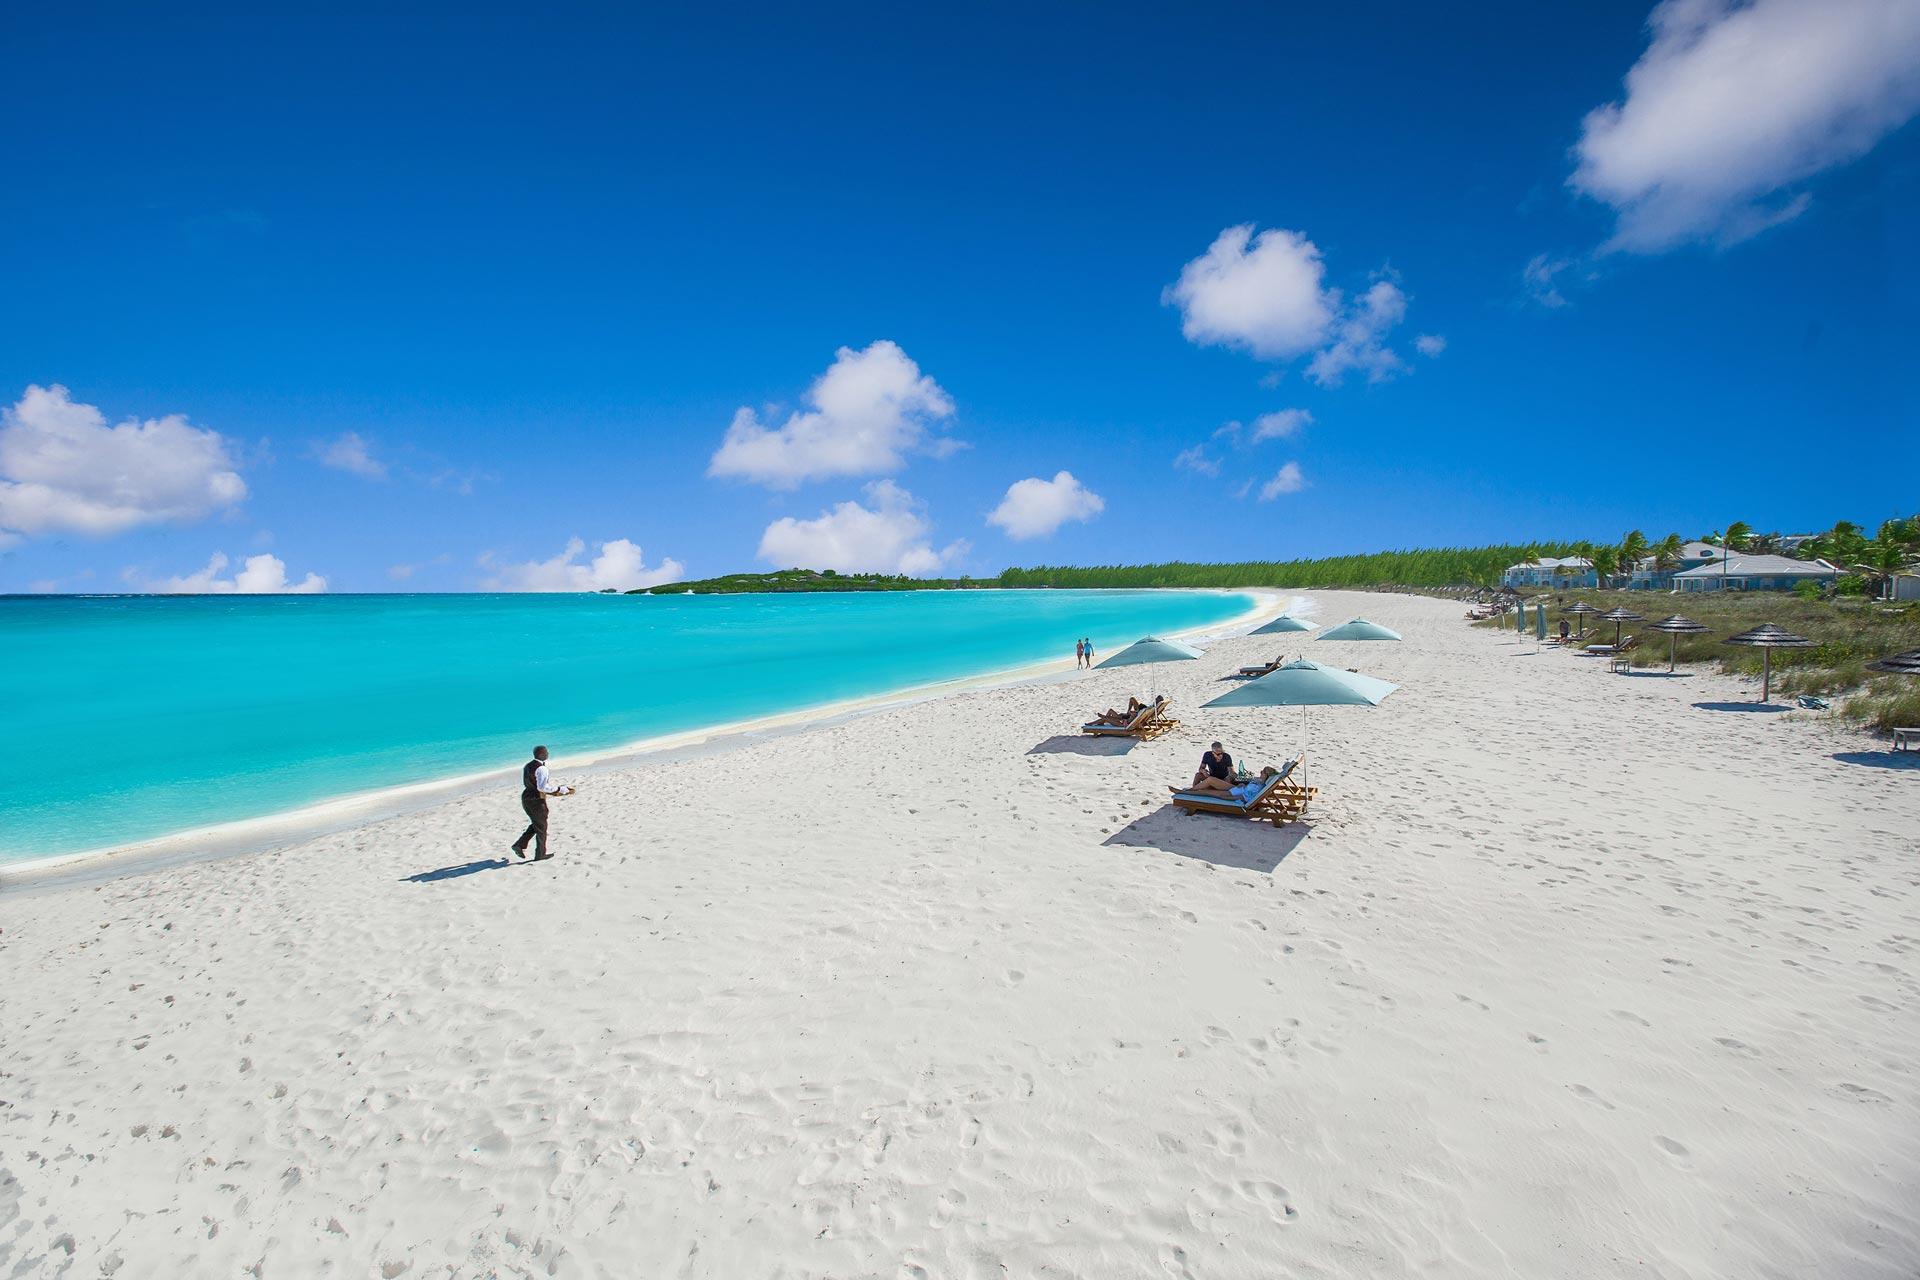 beach in exuma